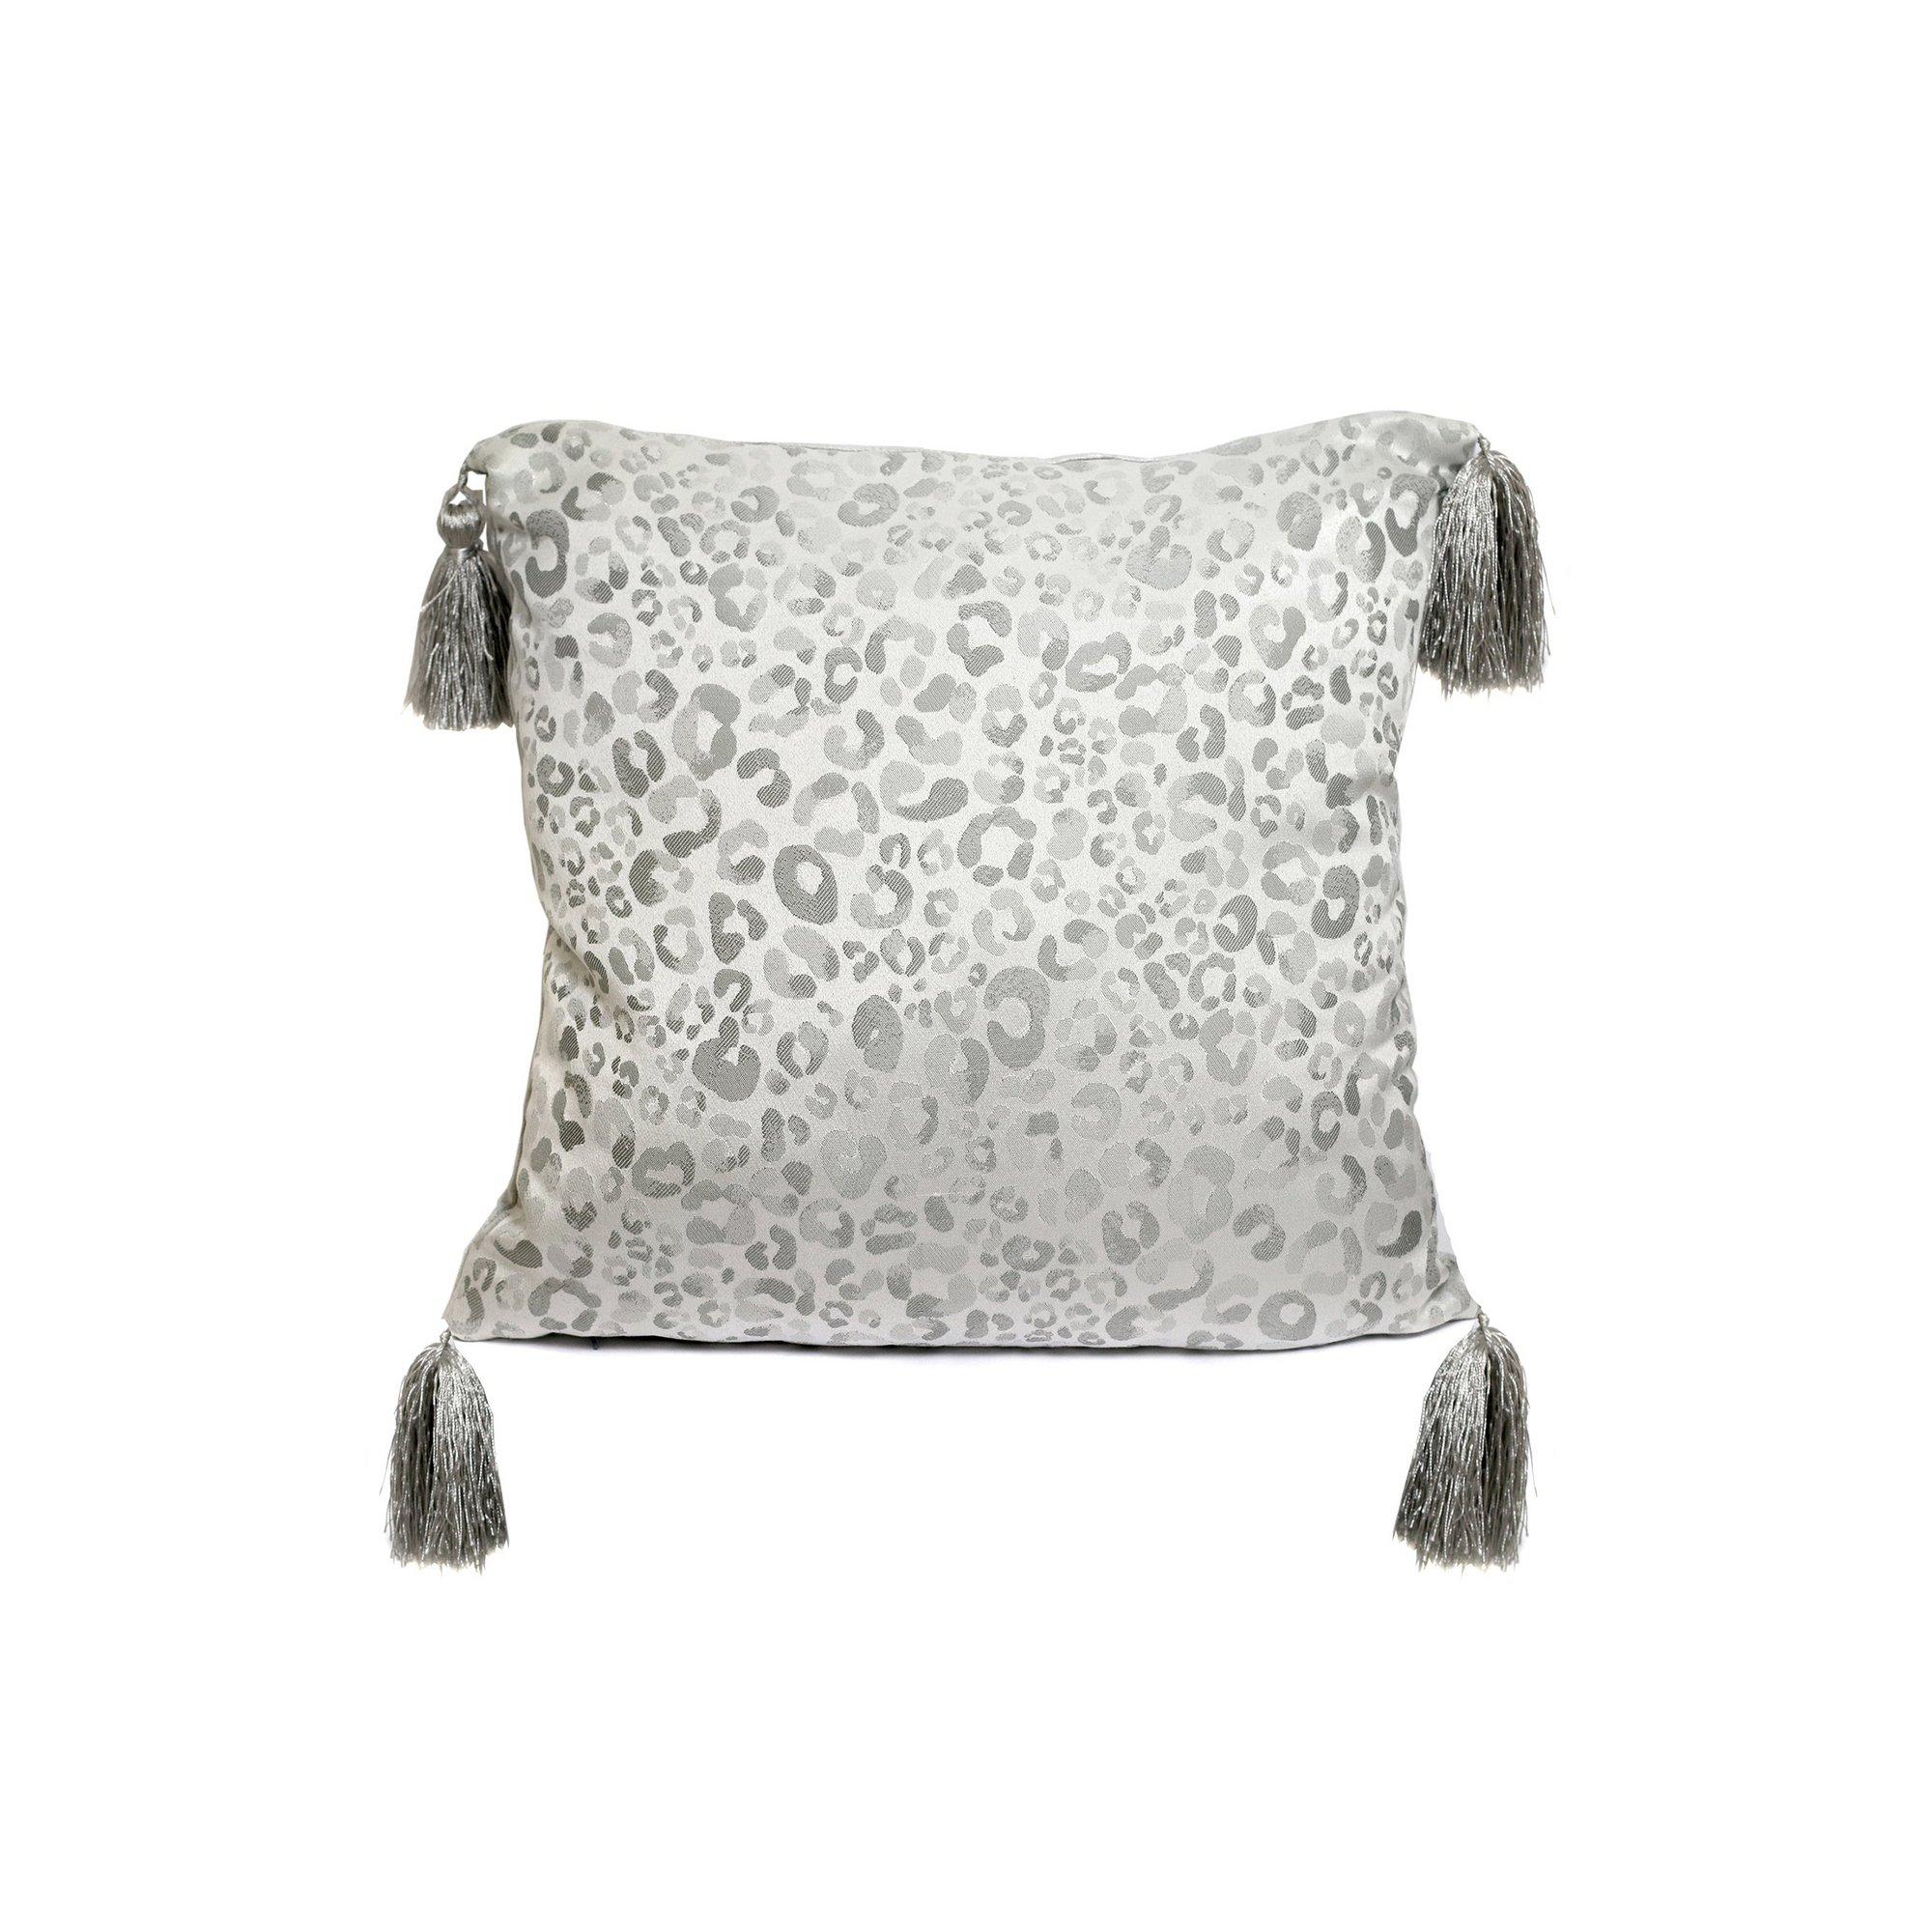 Image of Roar Silver Cushion